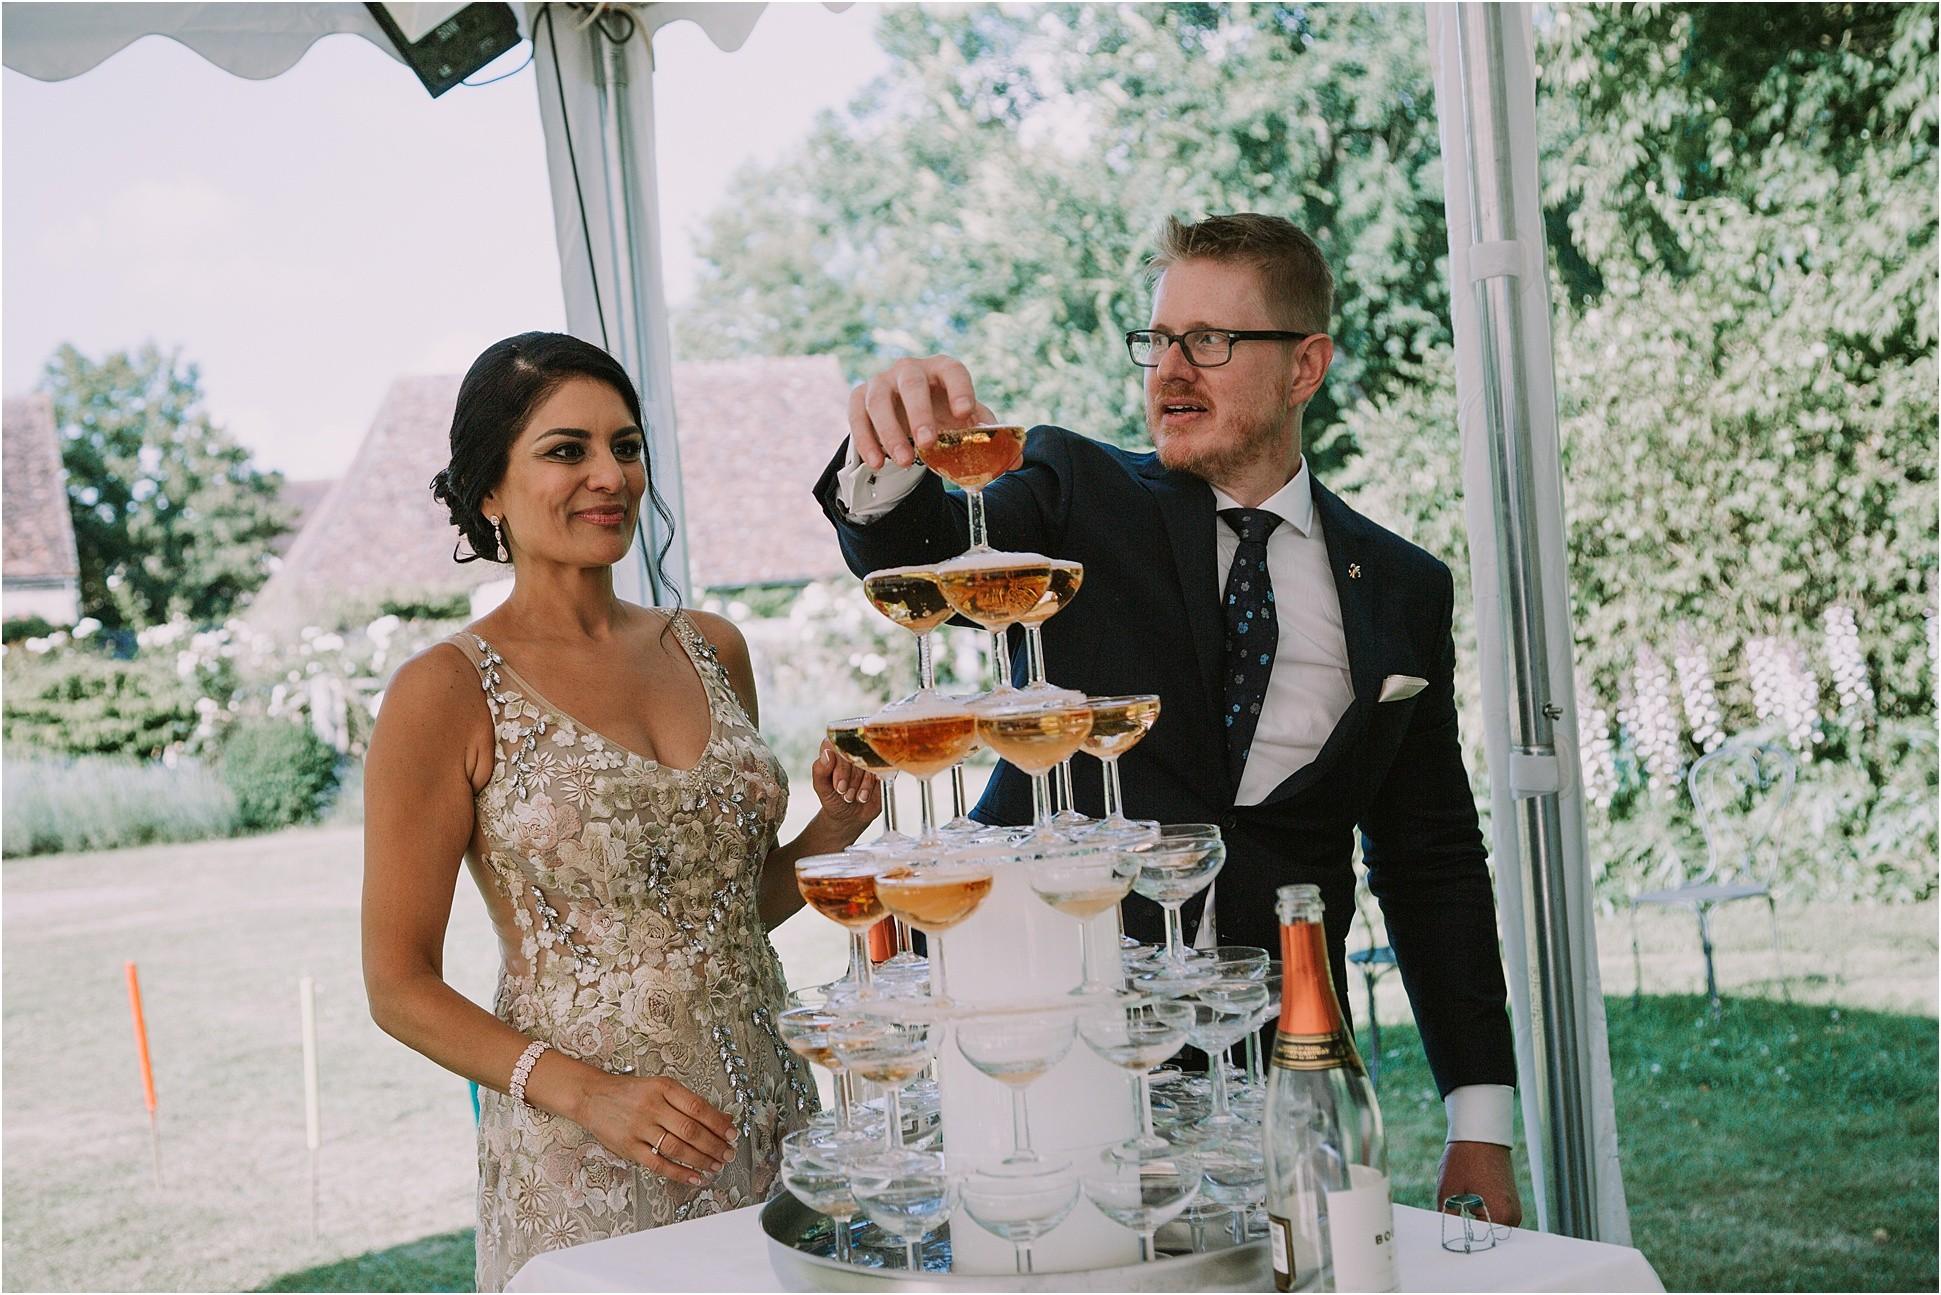 Kateryna-photos-photographe-mariage-chateau-st-paterne-mayenne-normandie_0139.jpg